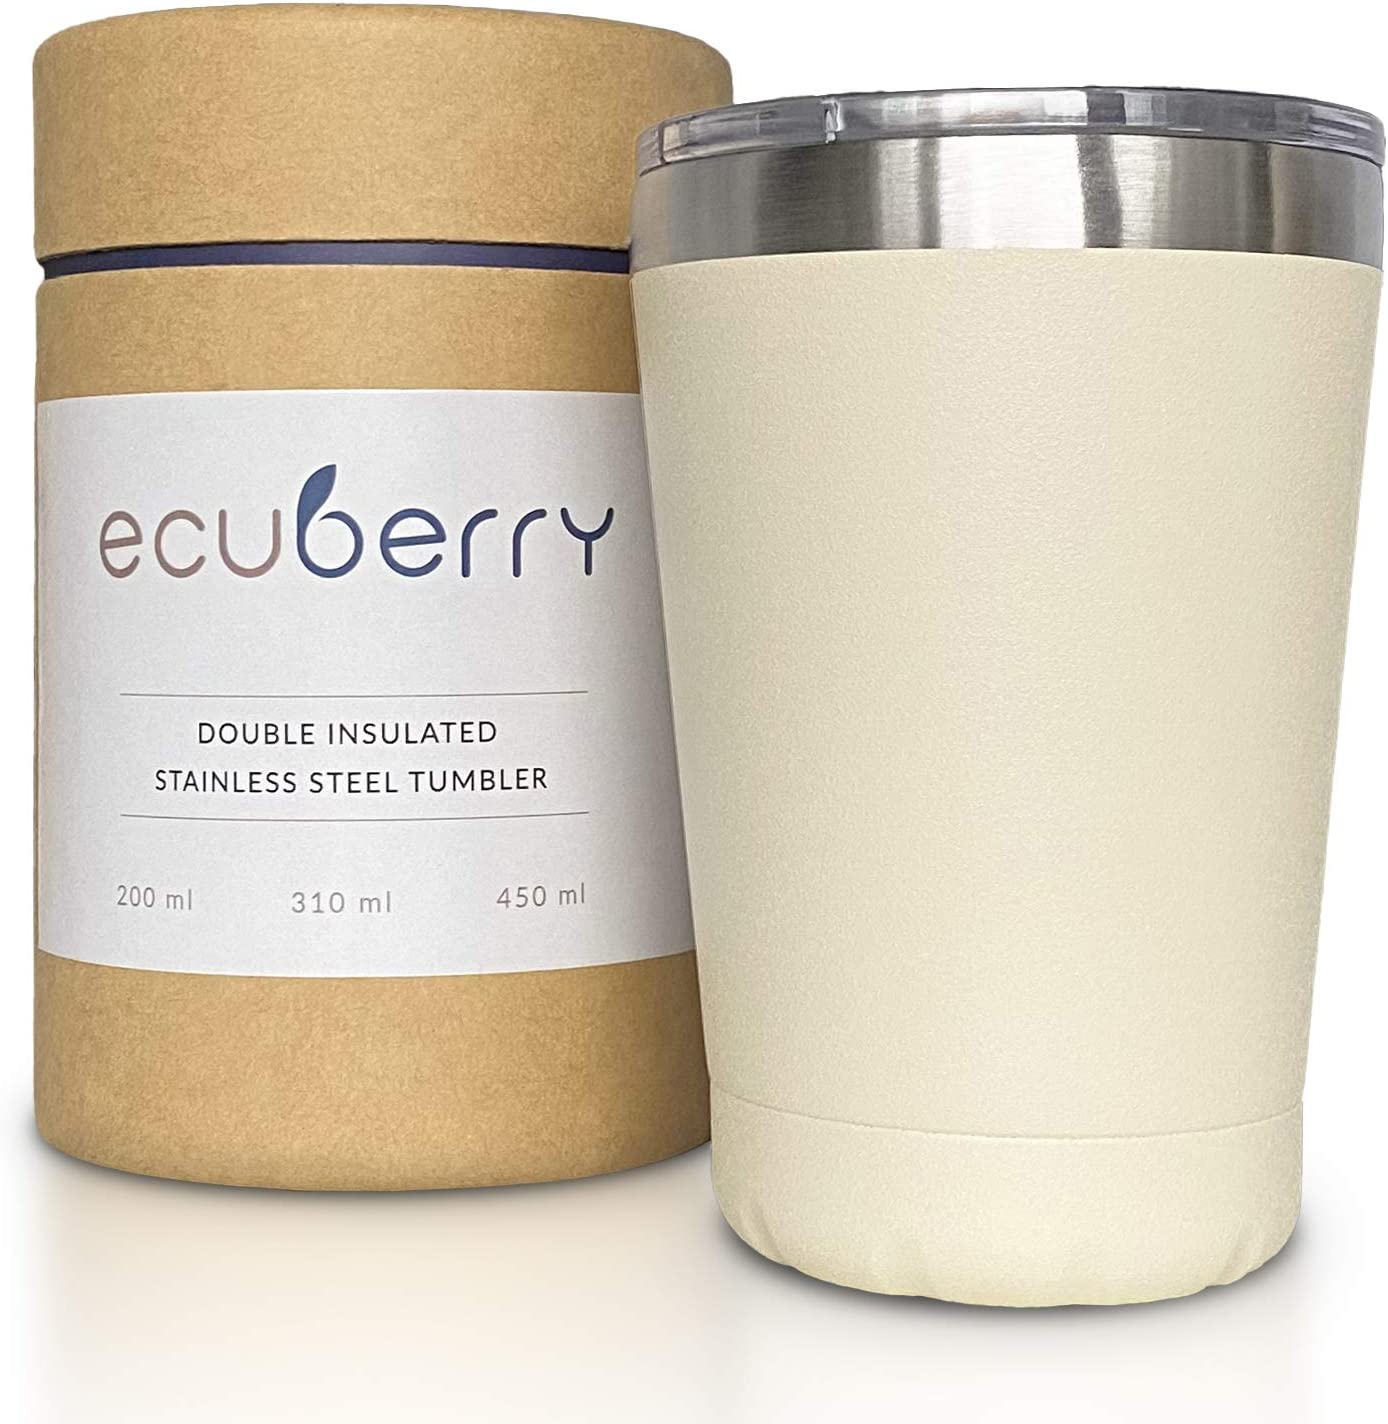 Ecuberry Taza de café expreso de 200 ml, de acero inoxidable, aislada al vacío, tapa deslizante a prueba de fugas, taza térmica de doble pared, taza de café y té para el hogar, oficina, coche